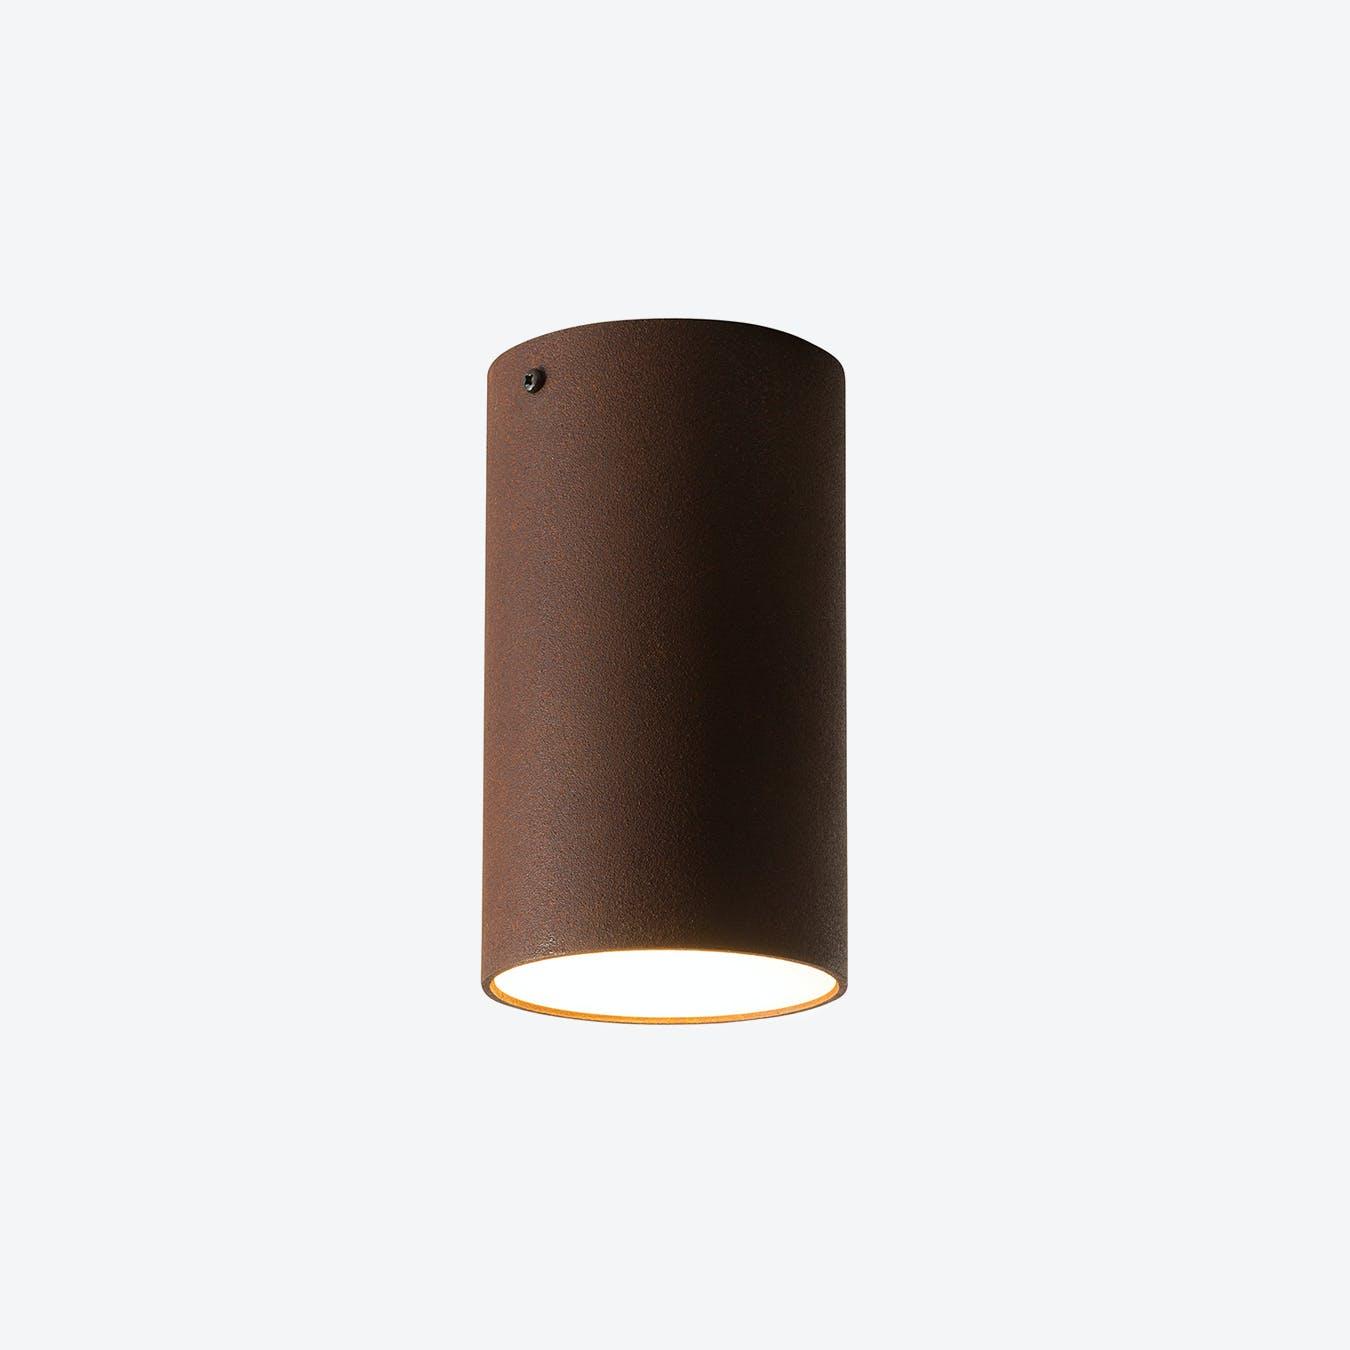 Roest Ceiling Lamp - 20 cm